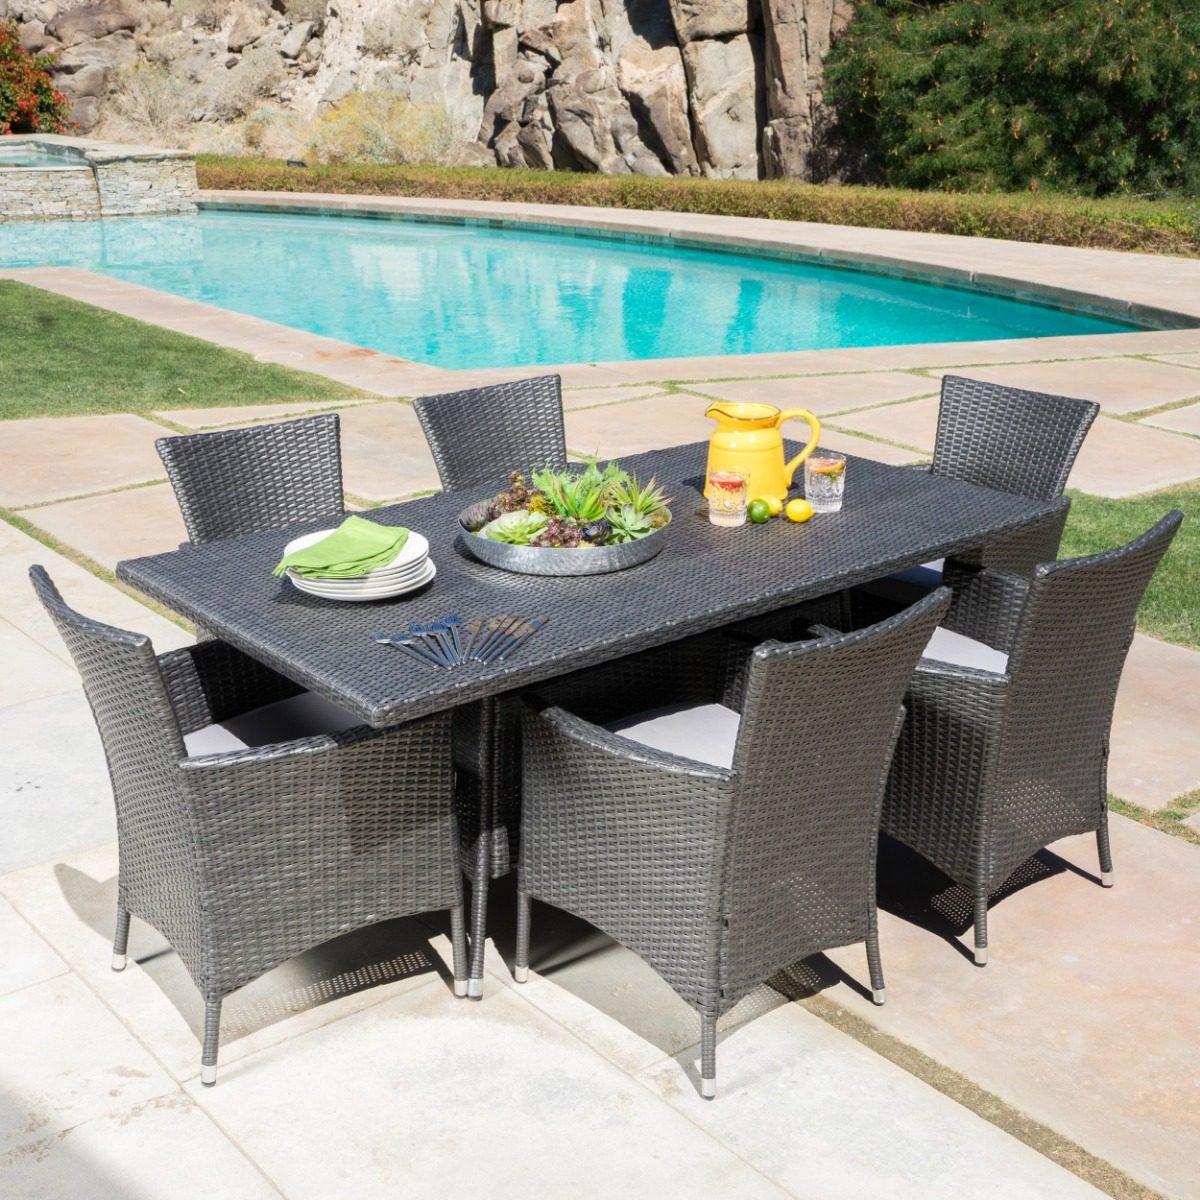 Comedor De Rattan Gris Mueble Para Jardin O Exterior - $ 28,999.00 ...